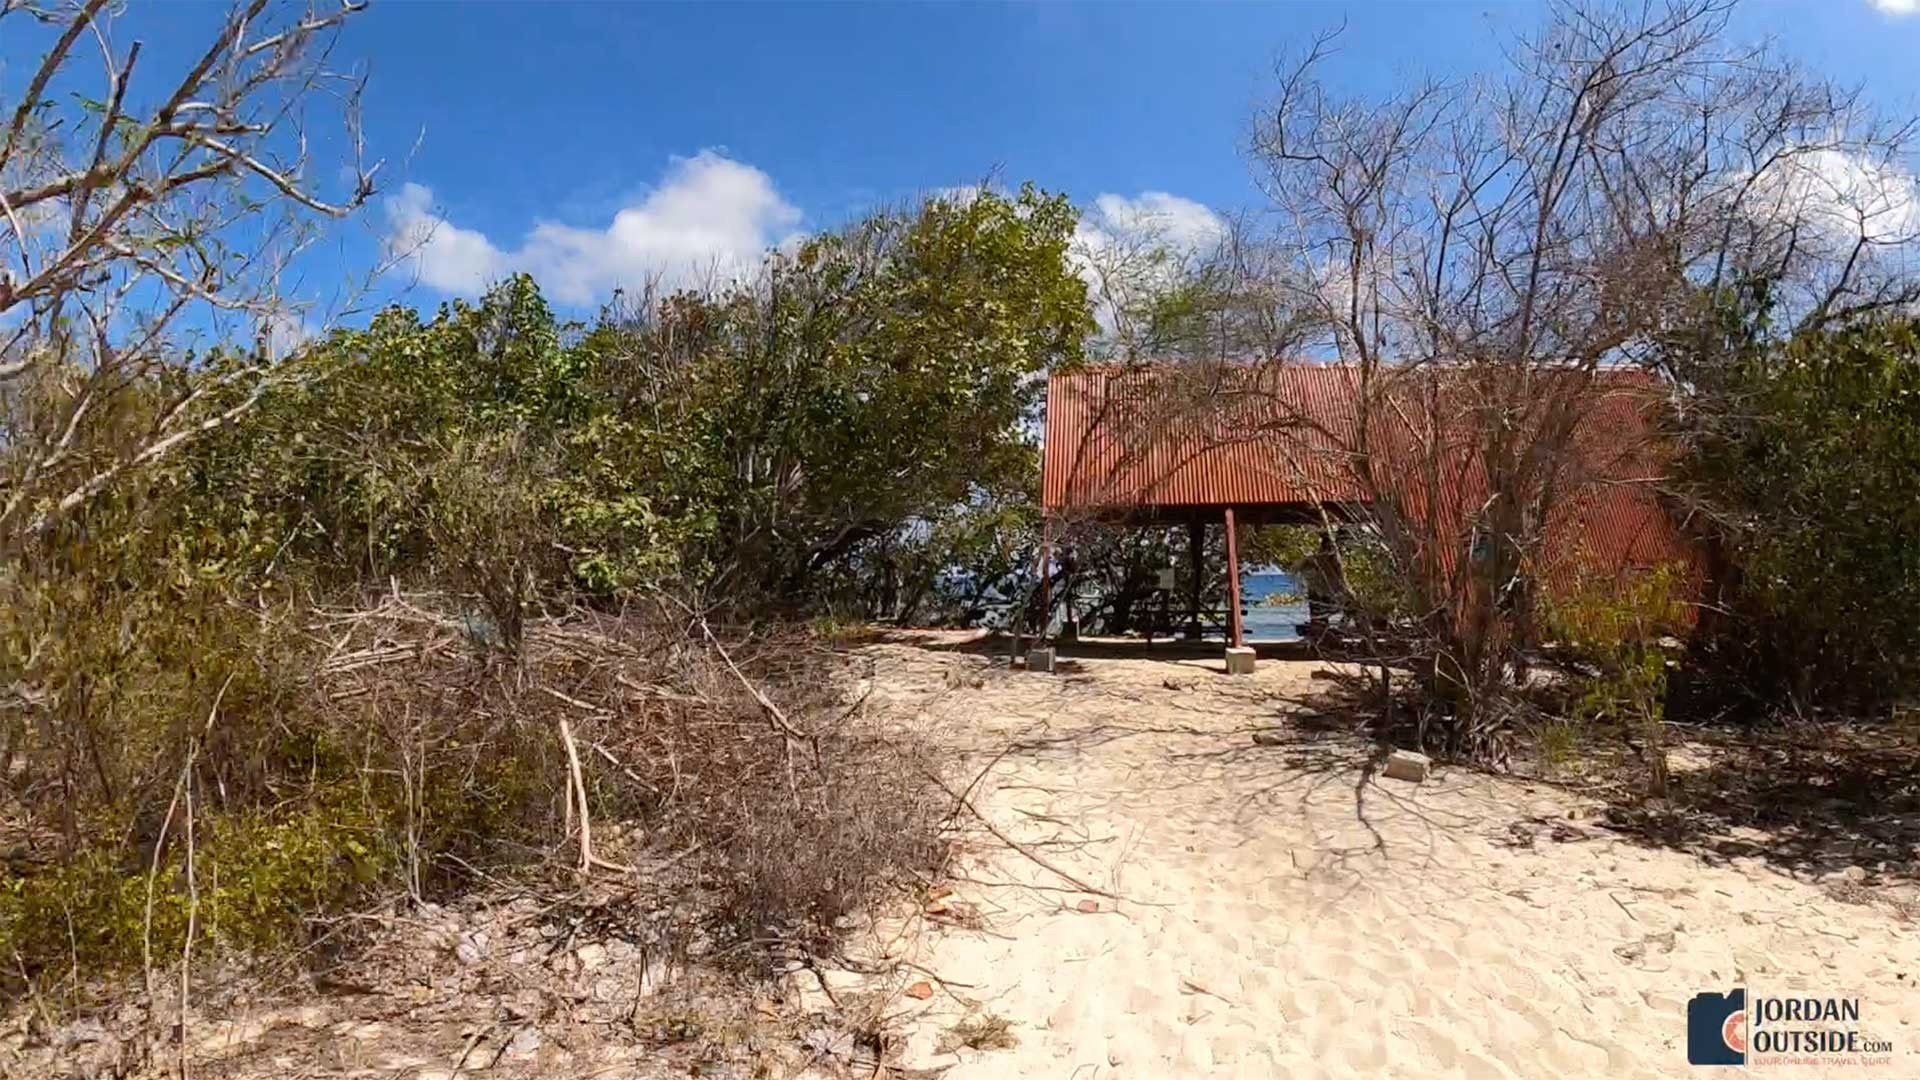 Red Pavilion at Jack's Bay Beach, St. Croix